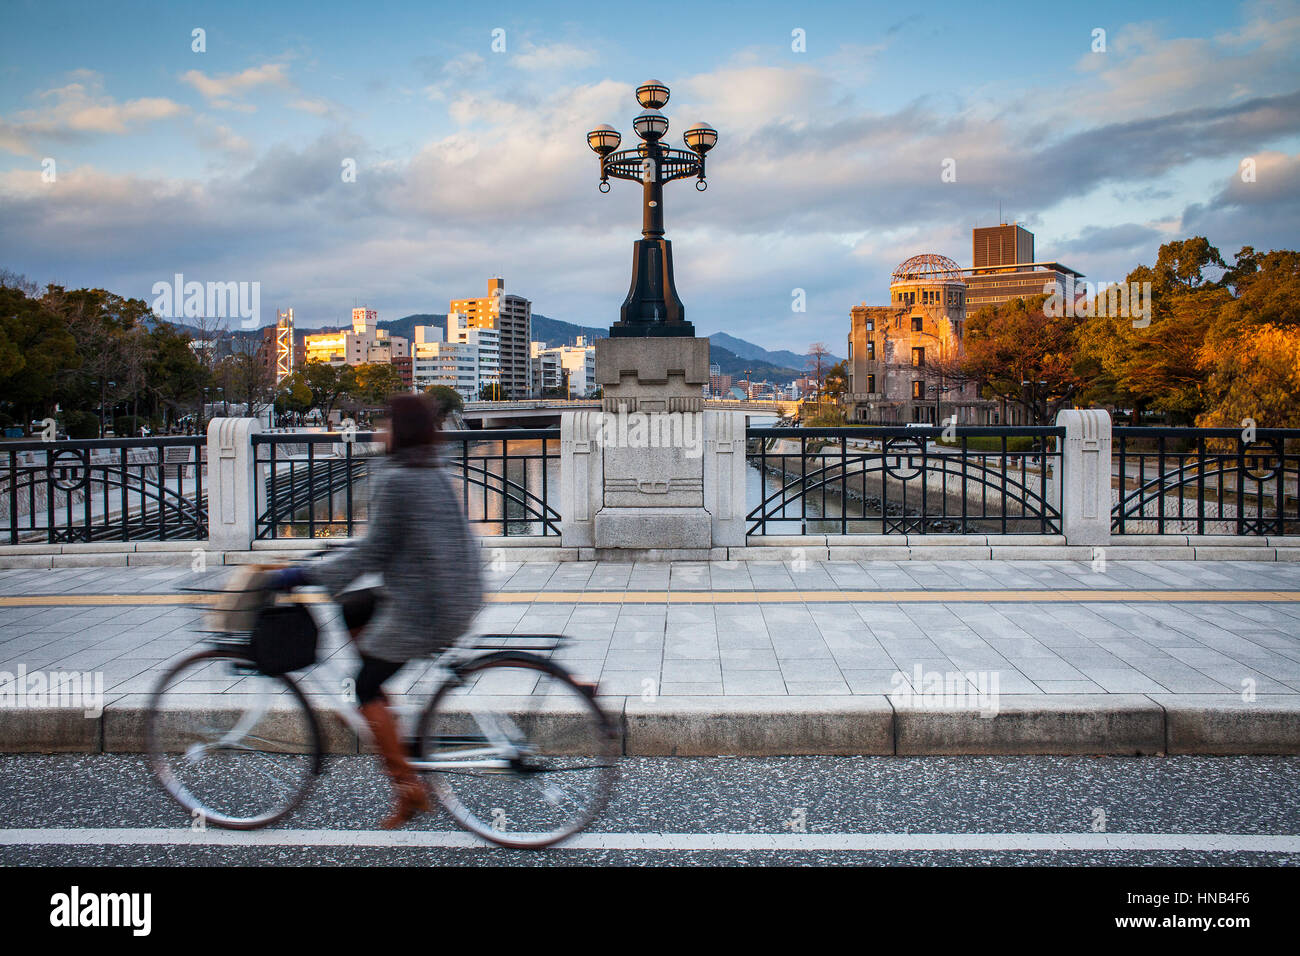 Heiwaohashi bridge,in background at right Atomic Bomb Dome, Hiroshima, Japan Stock Photo